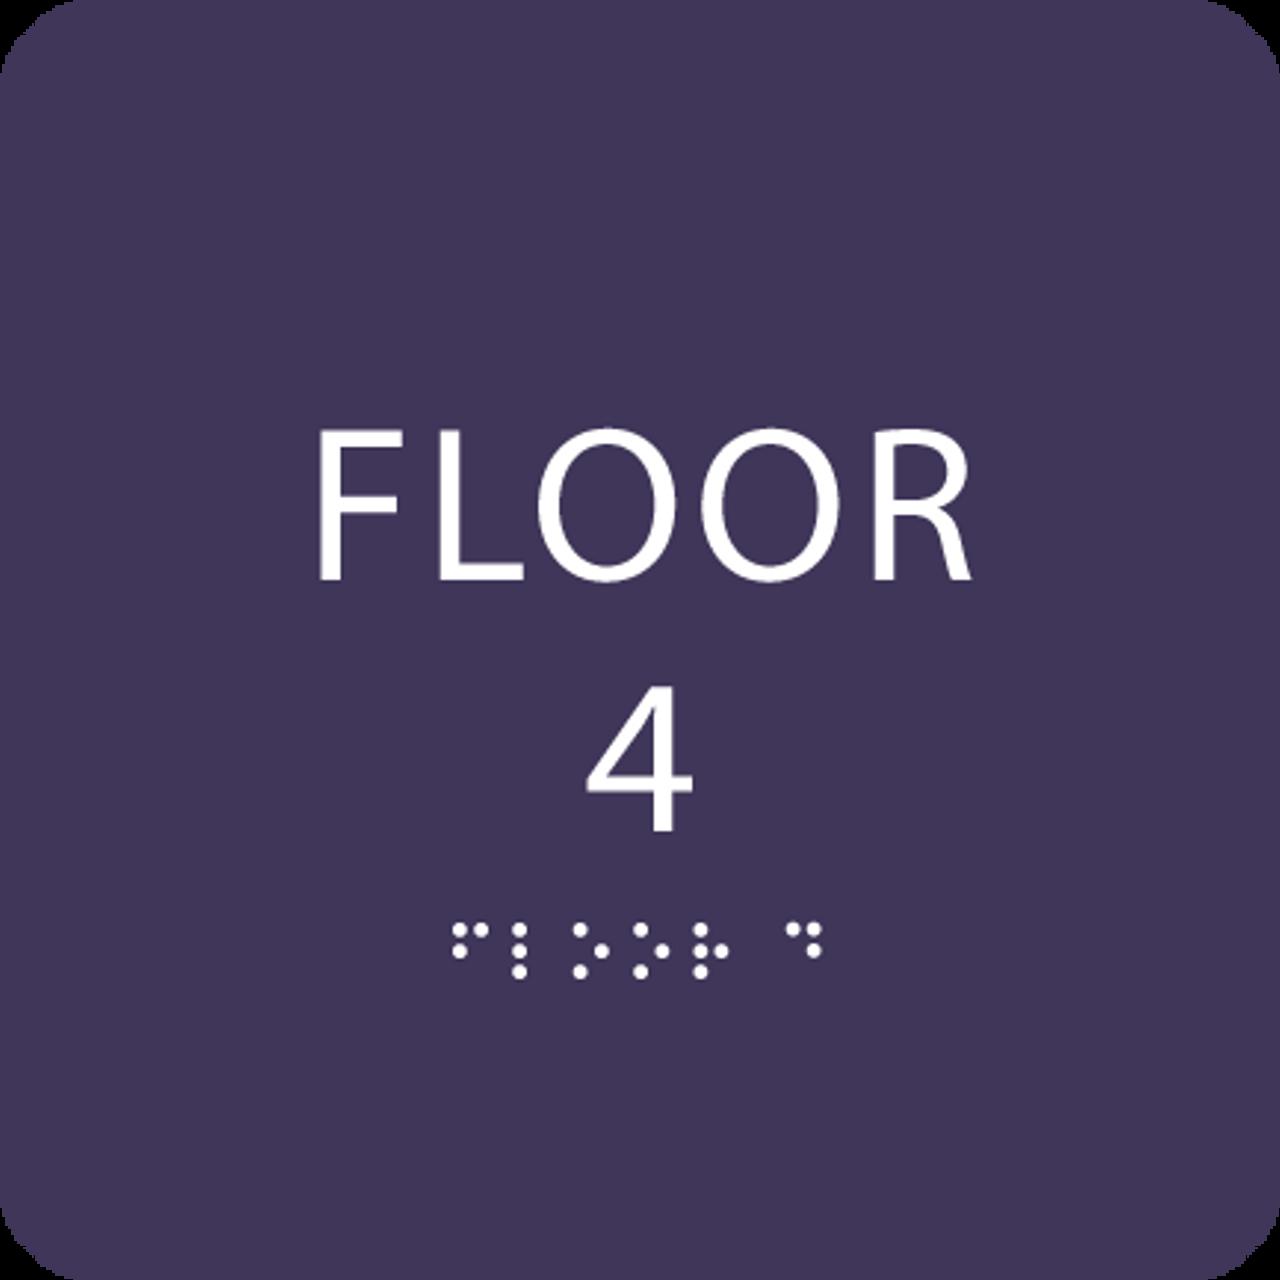 Purple Floor 4 Identification Sign